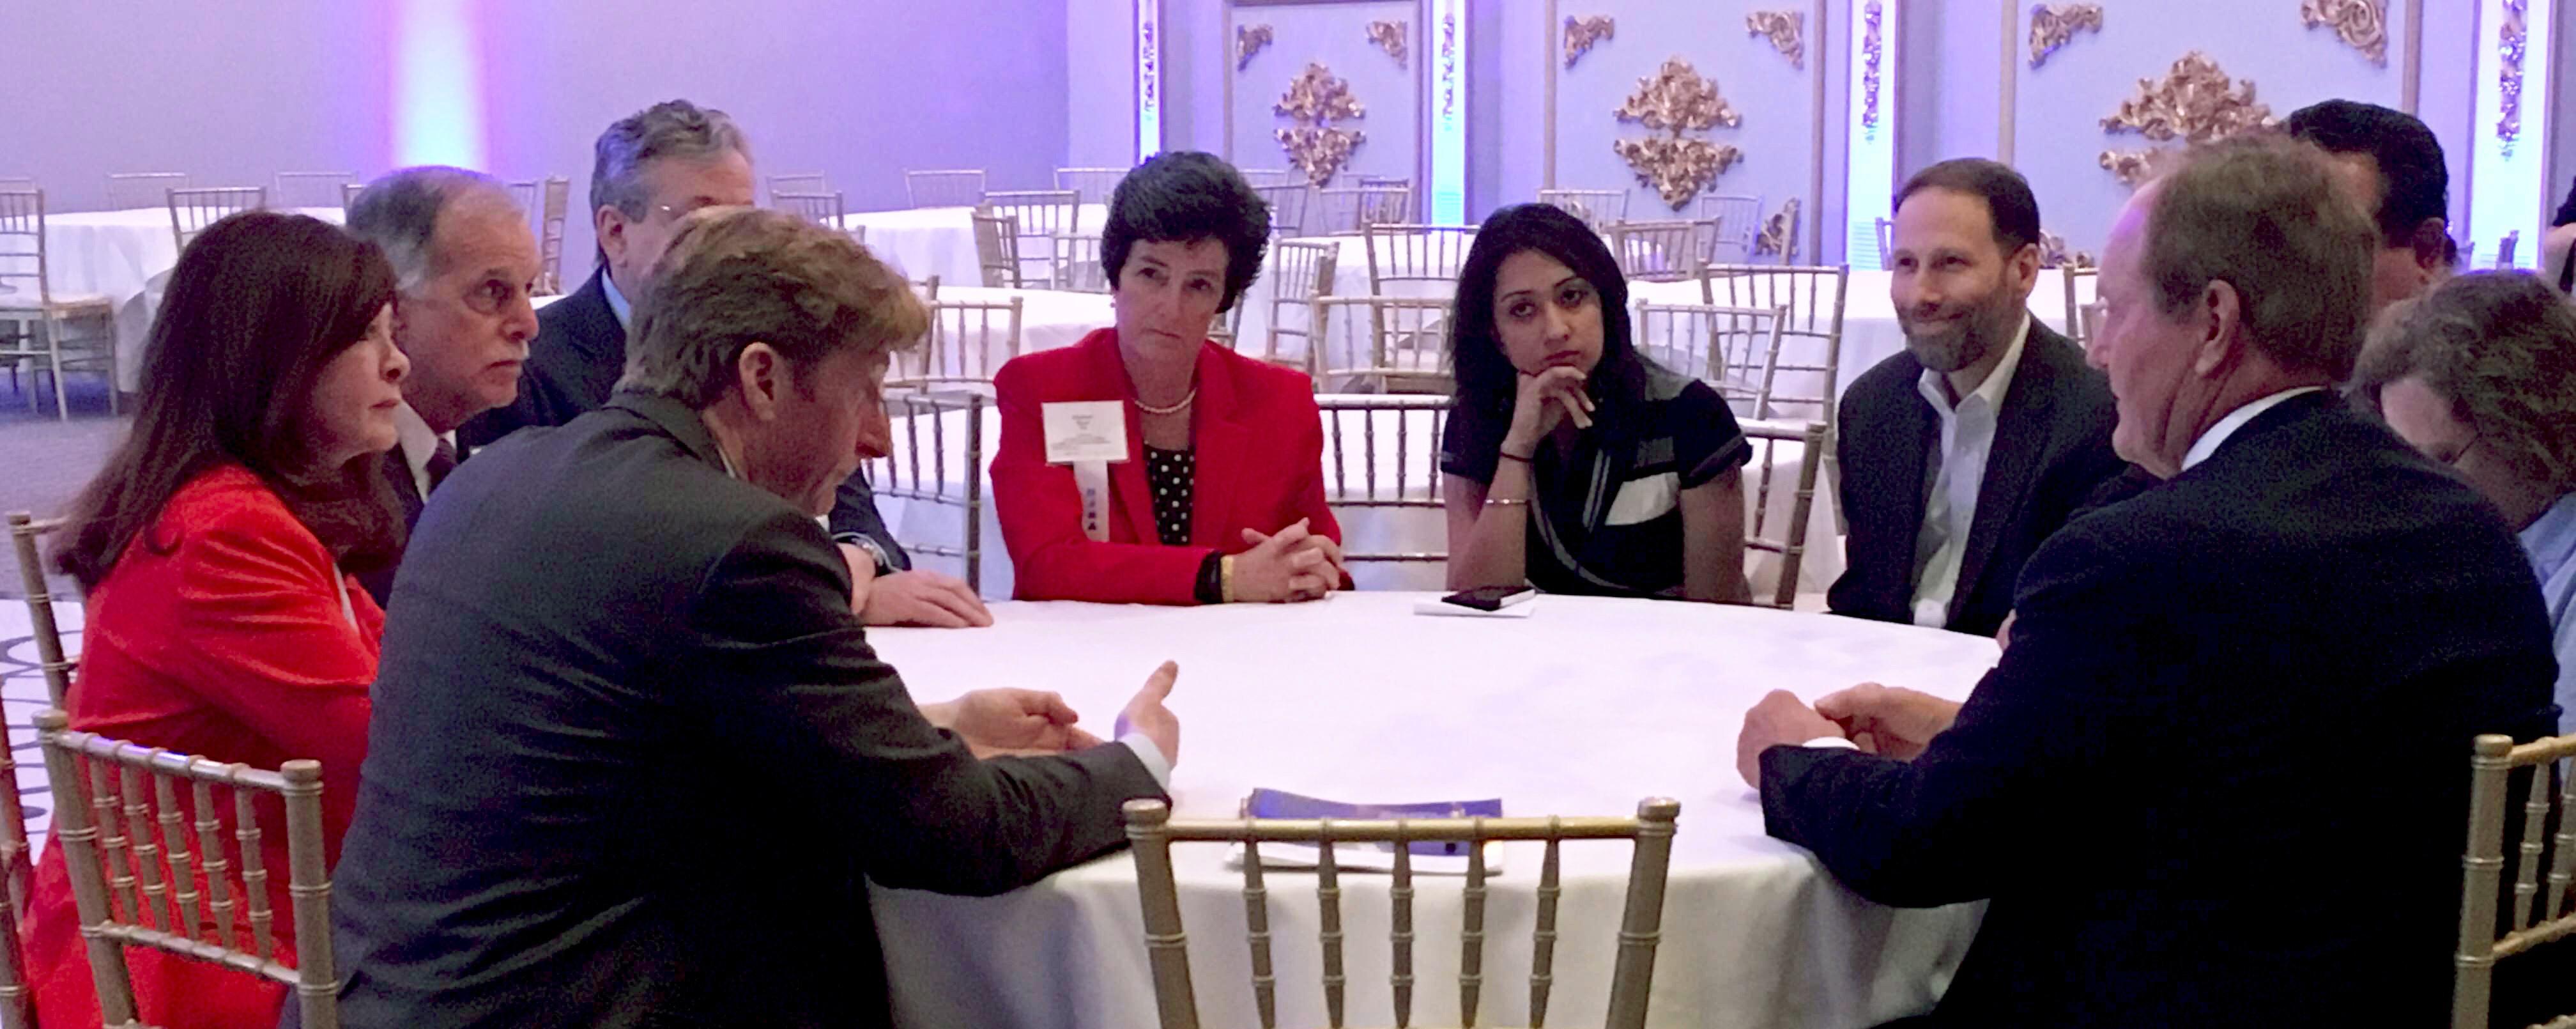 South Jersey Behavioral Health Innovation Collaborative